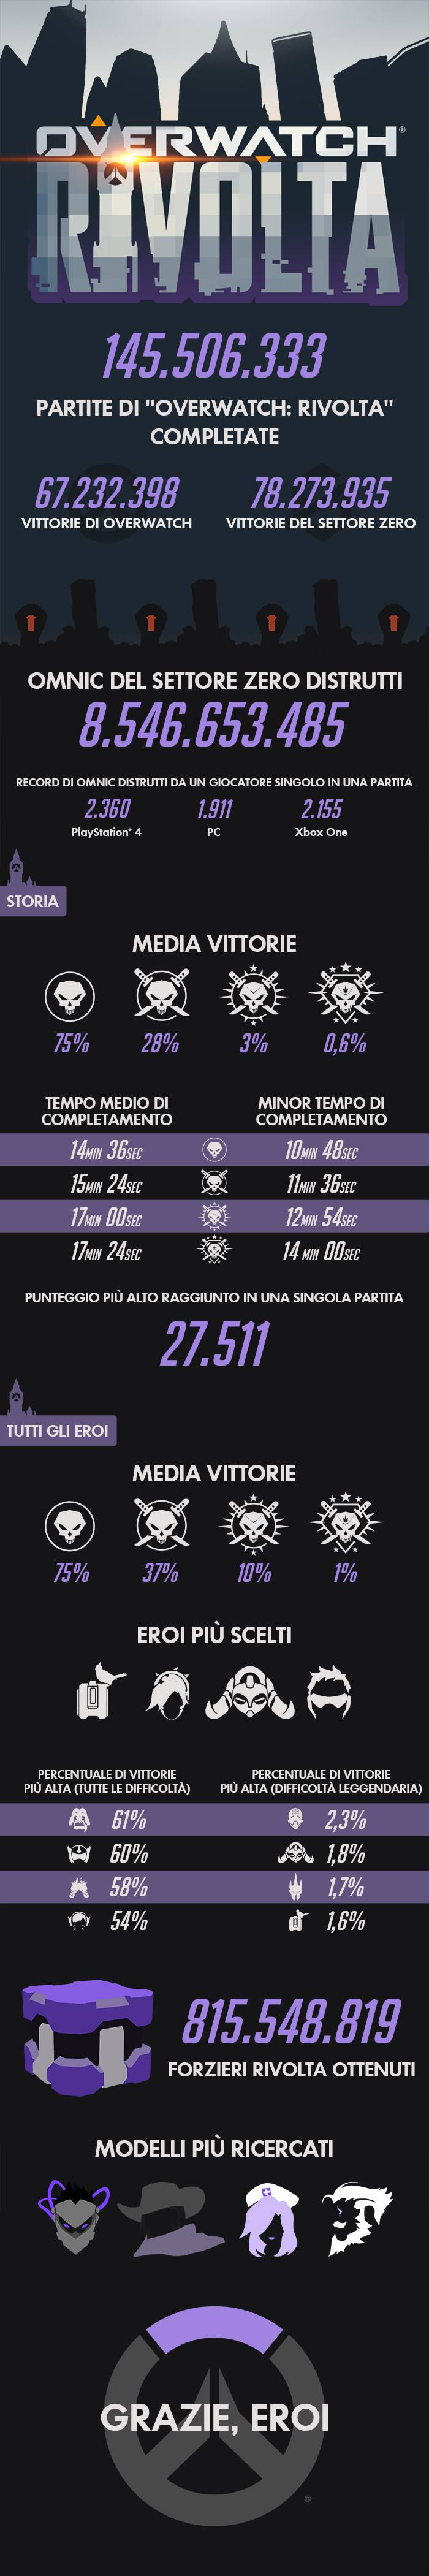 overwatch infografica evento 2017